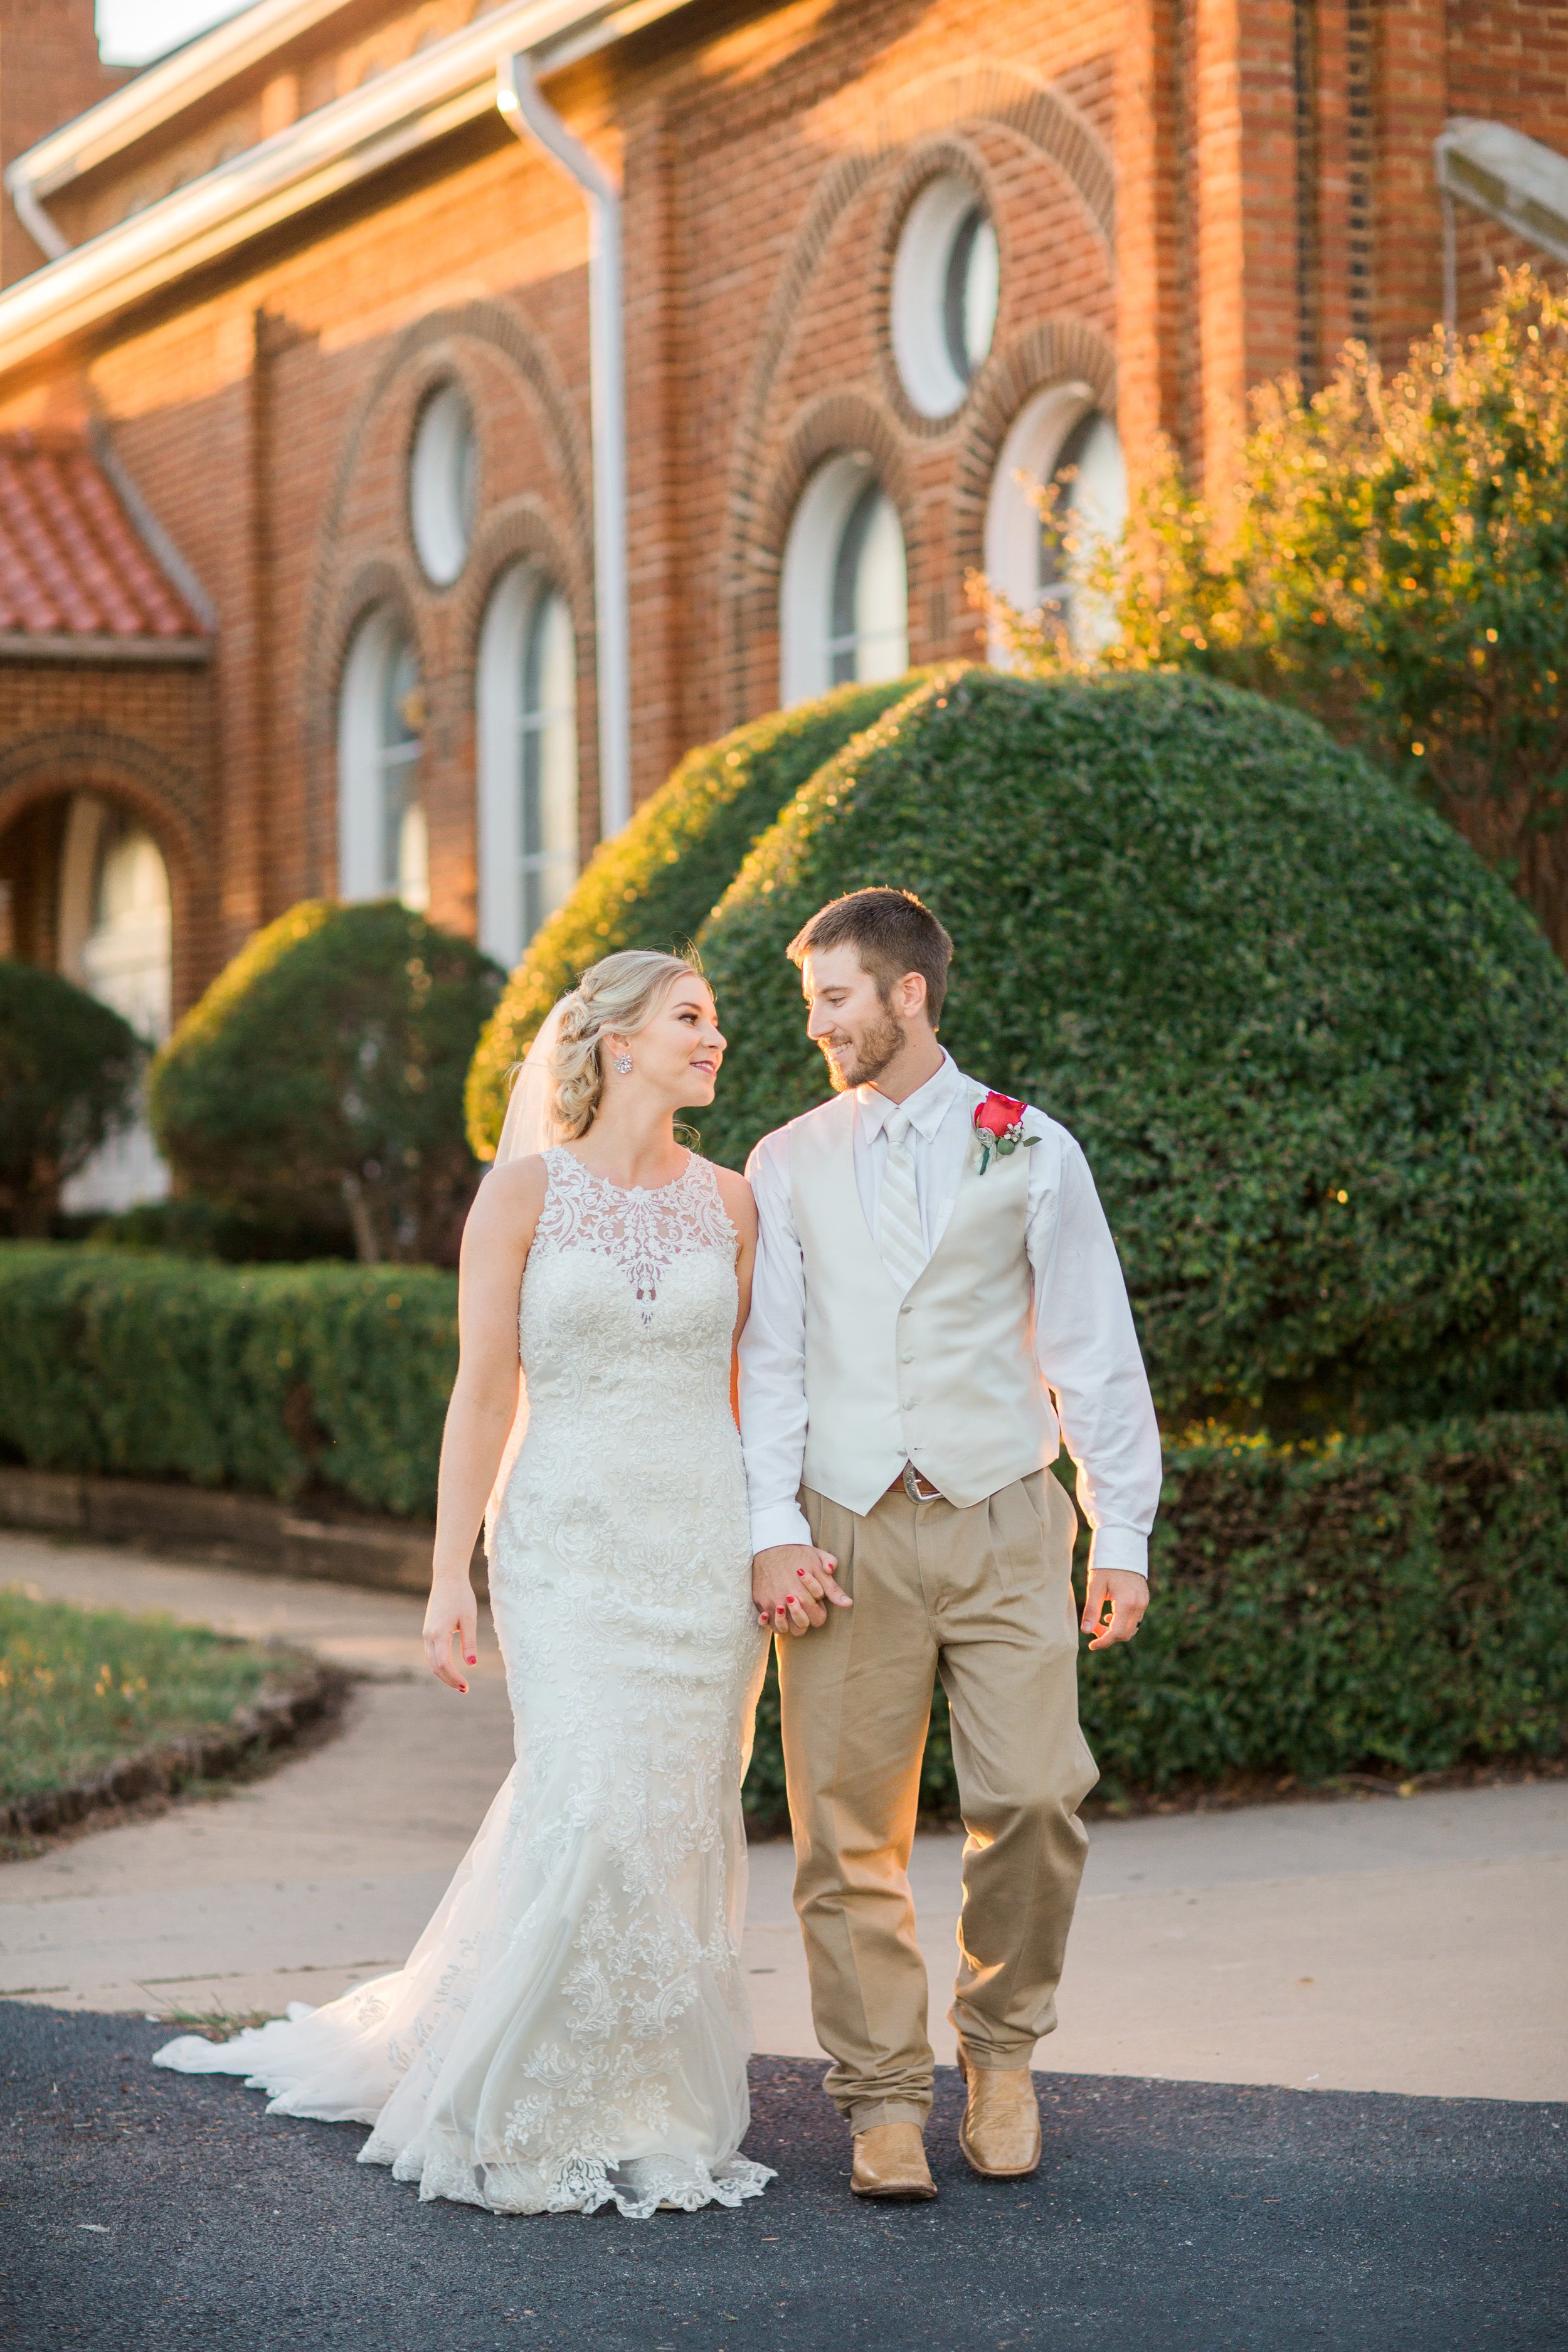 Bailey-Nathan-Windthorst-Texas-Wedding-060.jpg